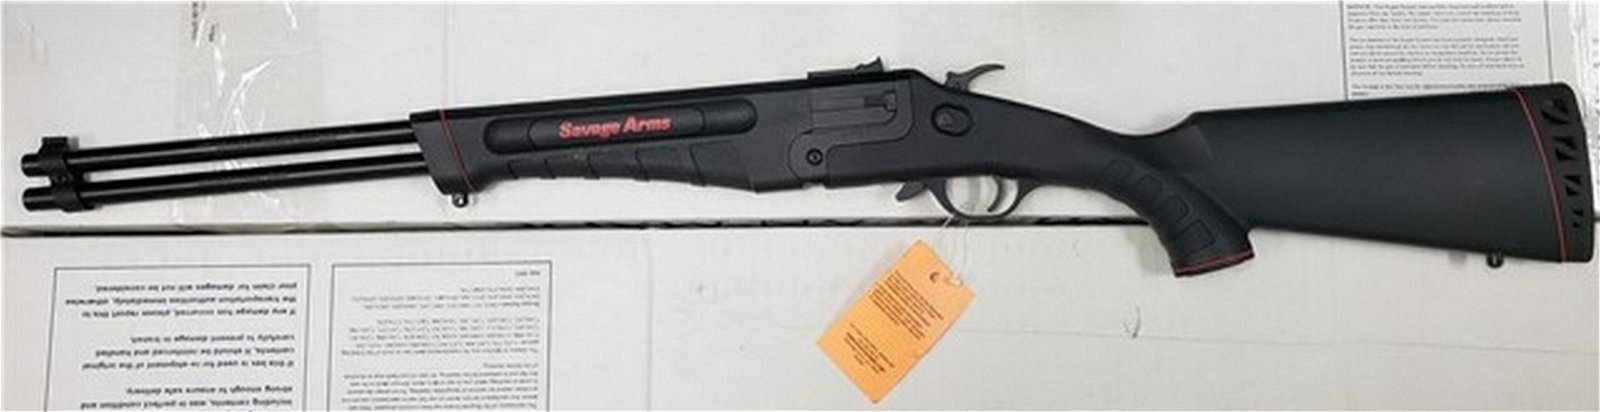 New Savage 42 .22LR/.410 Gauge Rifle